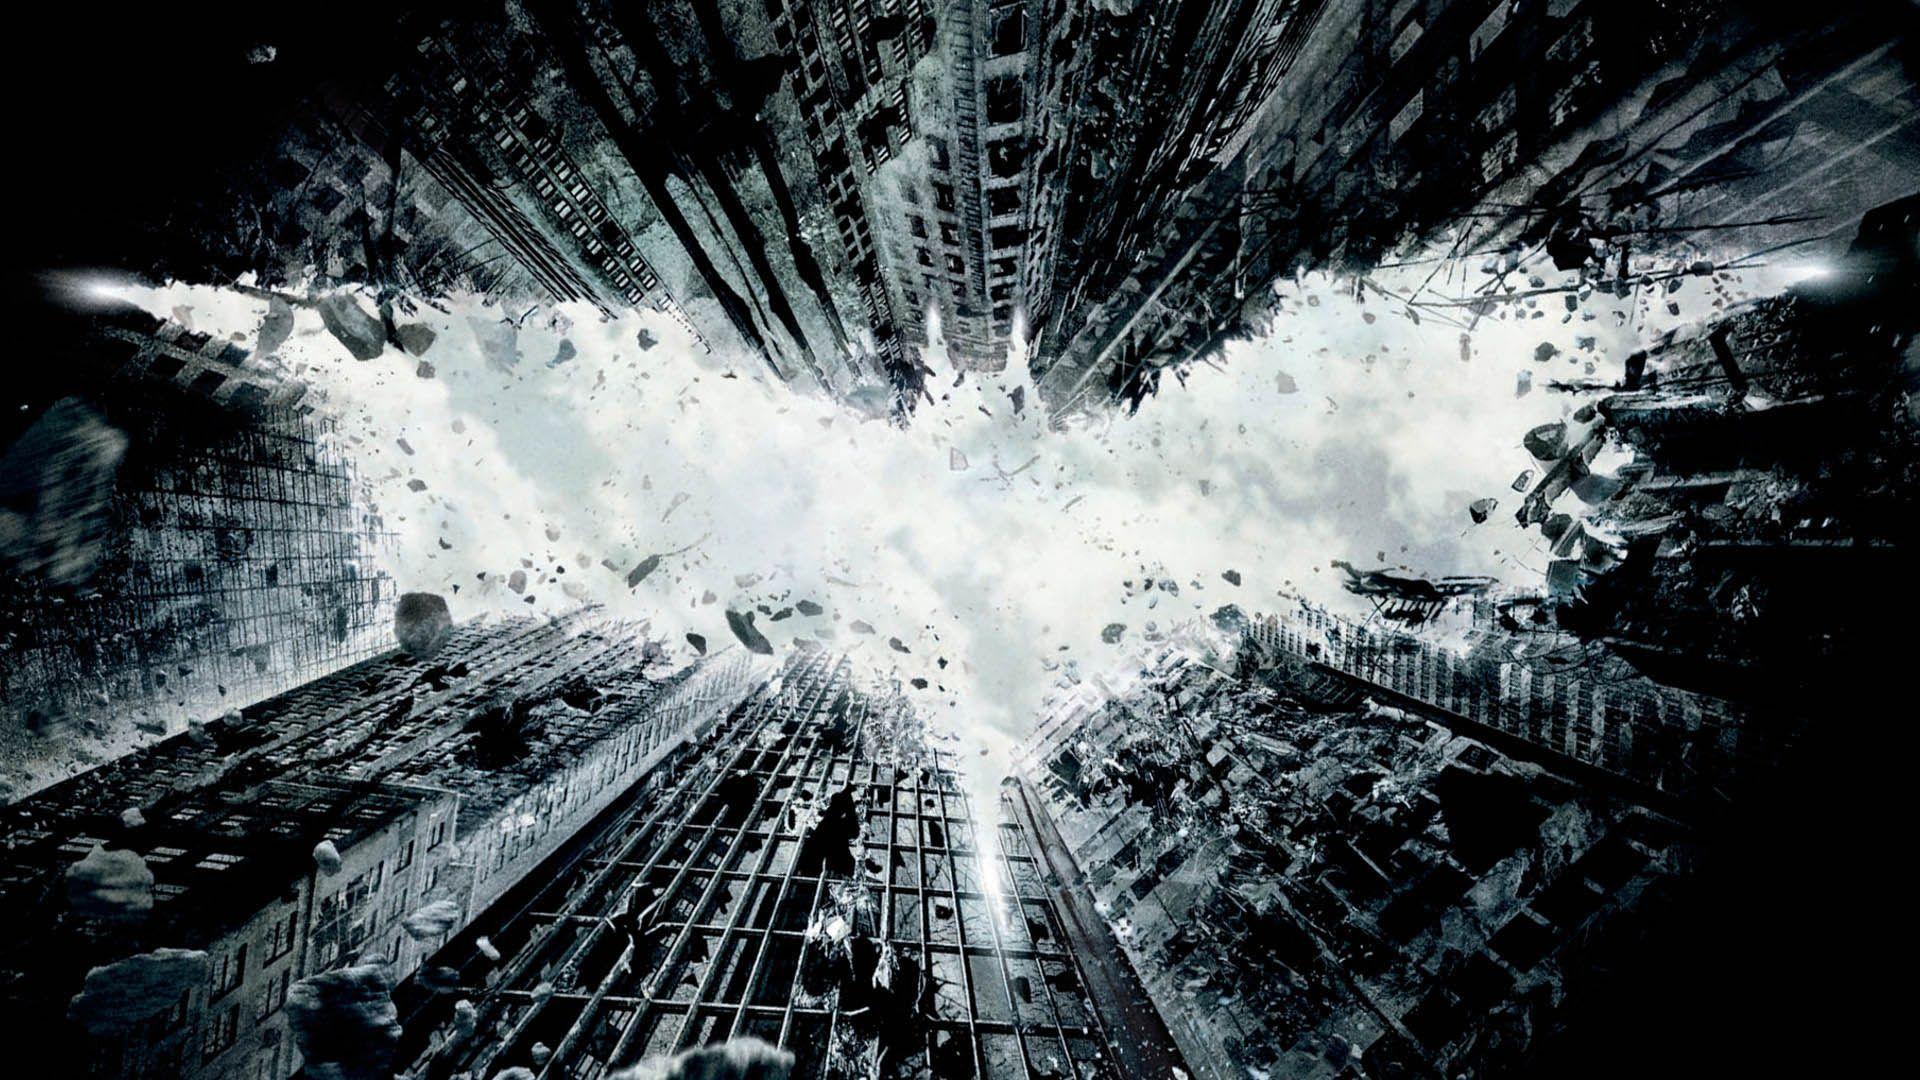 Hd wallpaper cave - The Dark Knight Rises Wallpapers Hd 1920x1080 Wallpaper Cave